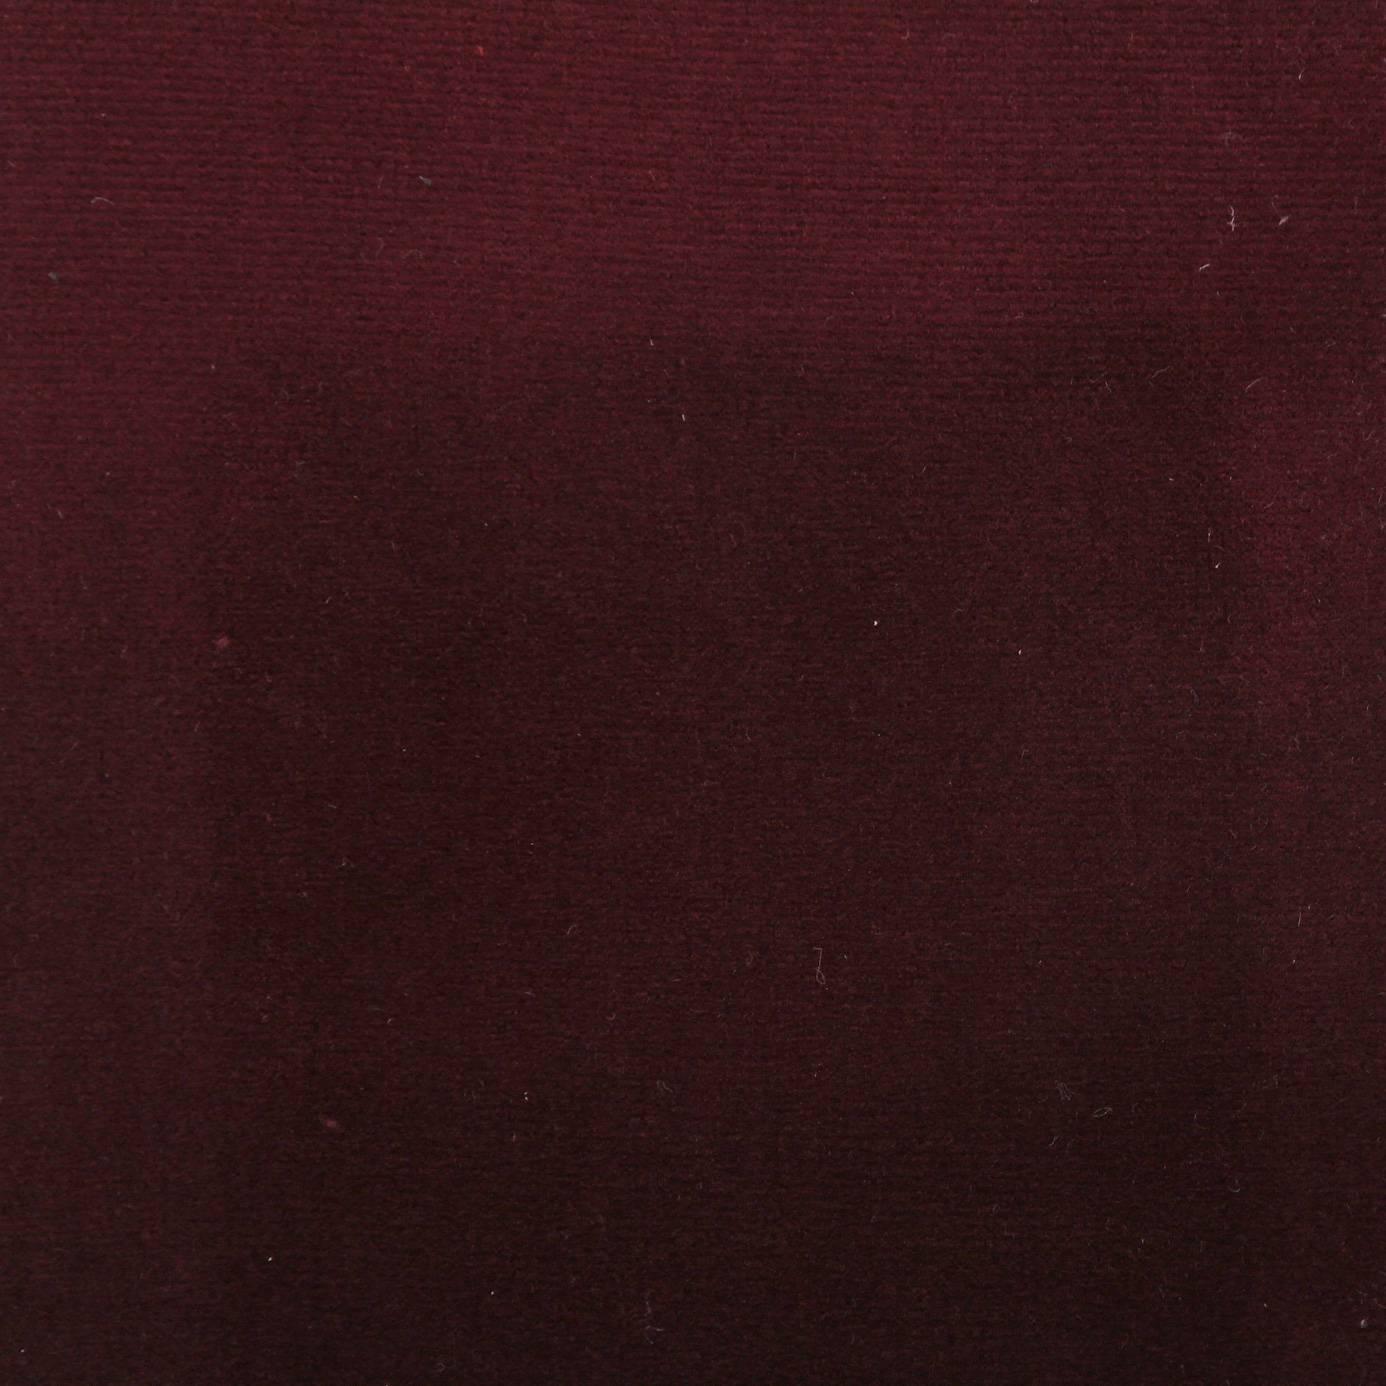 Plush Velvet Fabric Burgundy Plushvburngundy Warwick